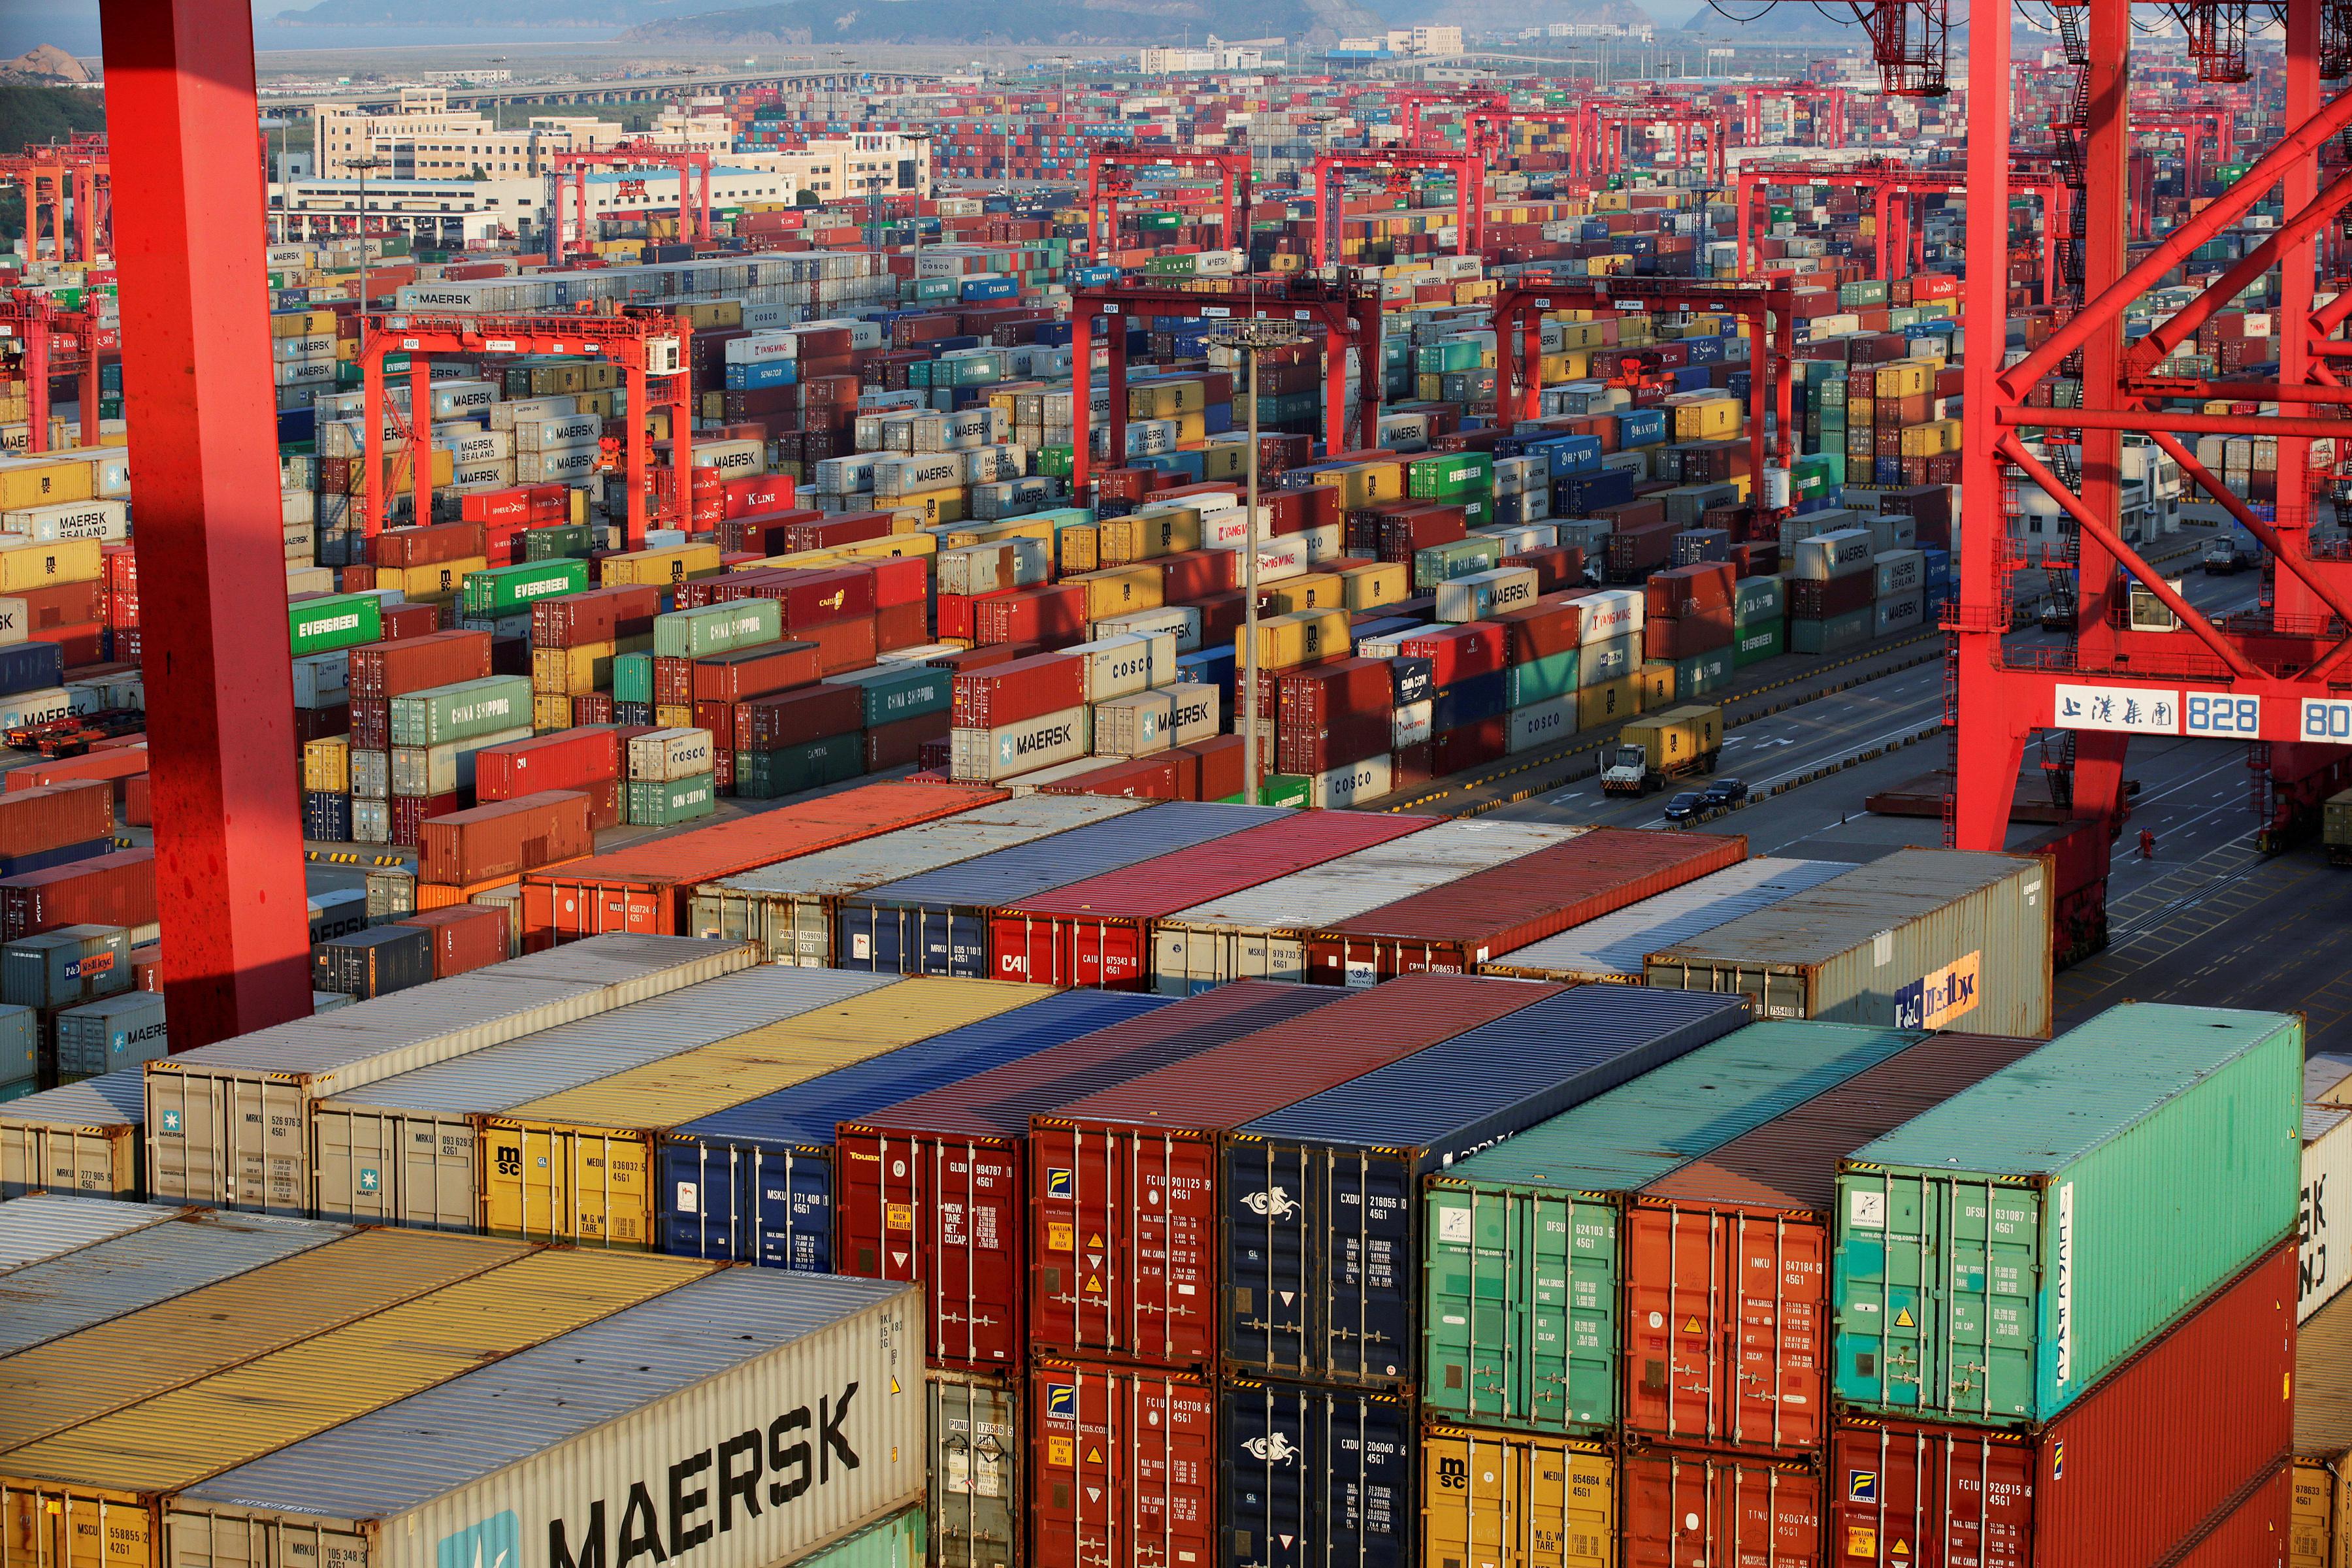 chine-commerce-balance-commerciale-conteneur-shipping-marchandises